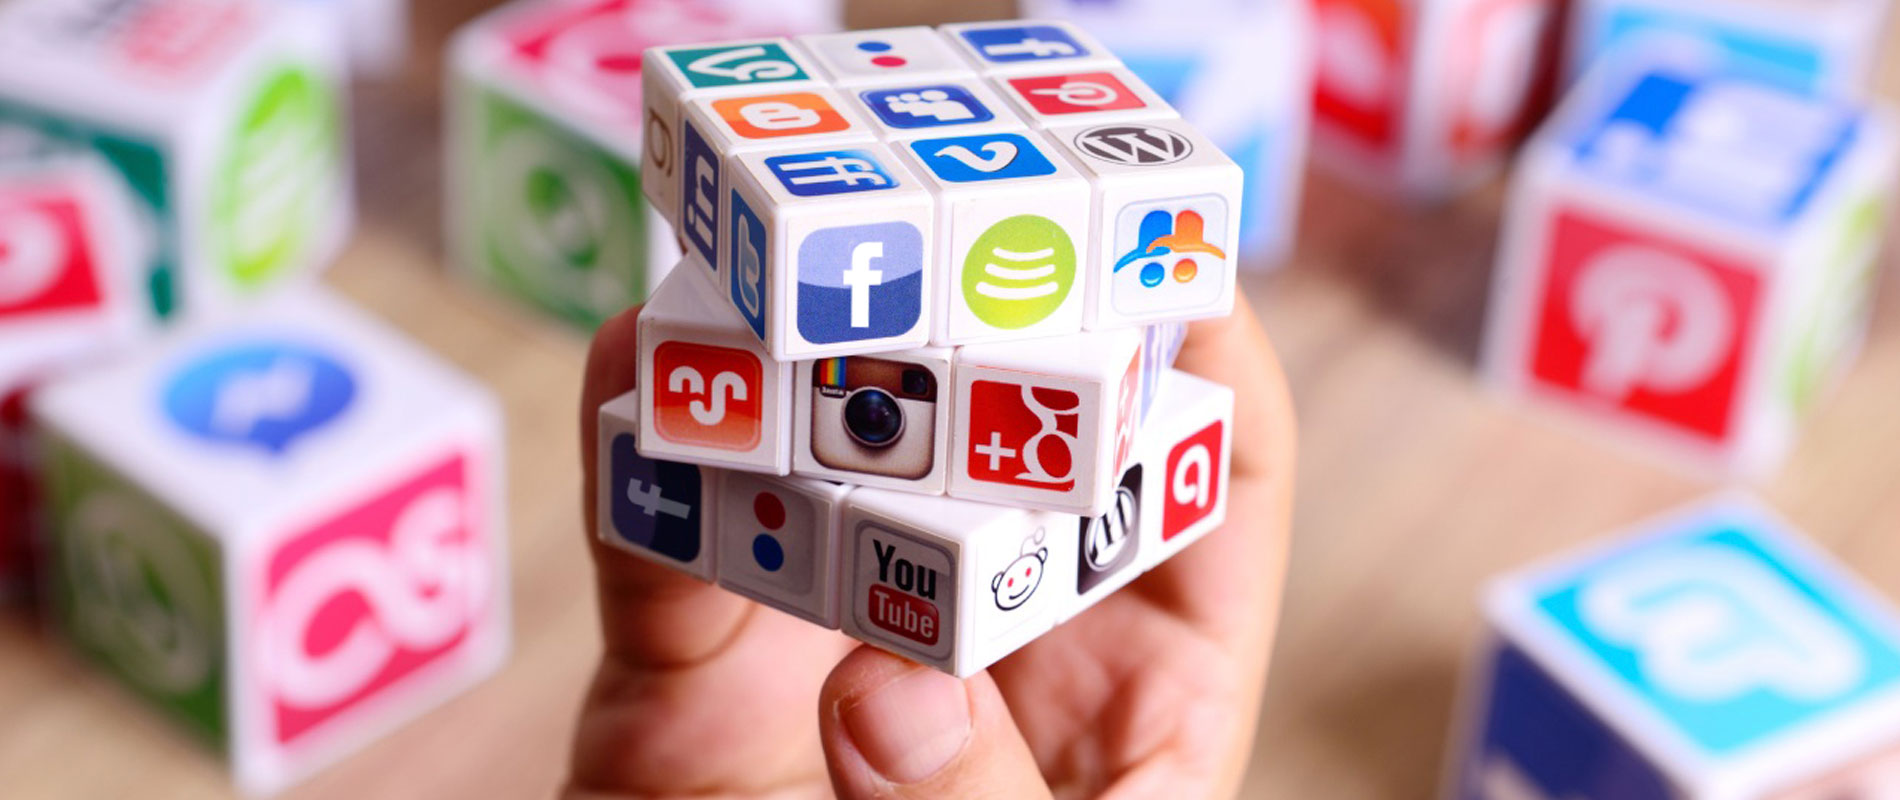 Entenda a importância das redes sociais para o seu e-commerce